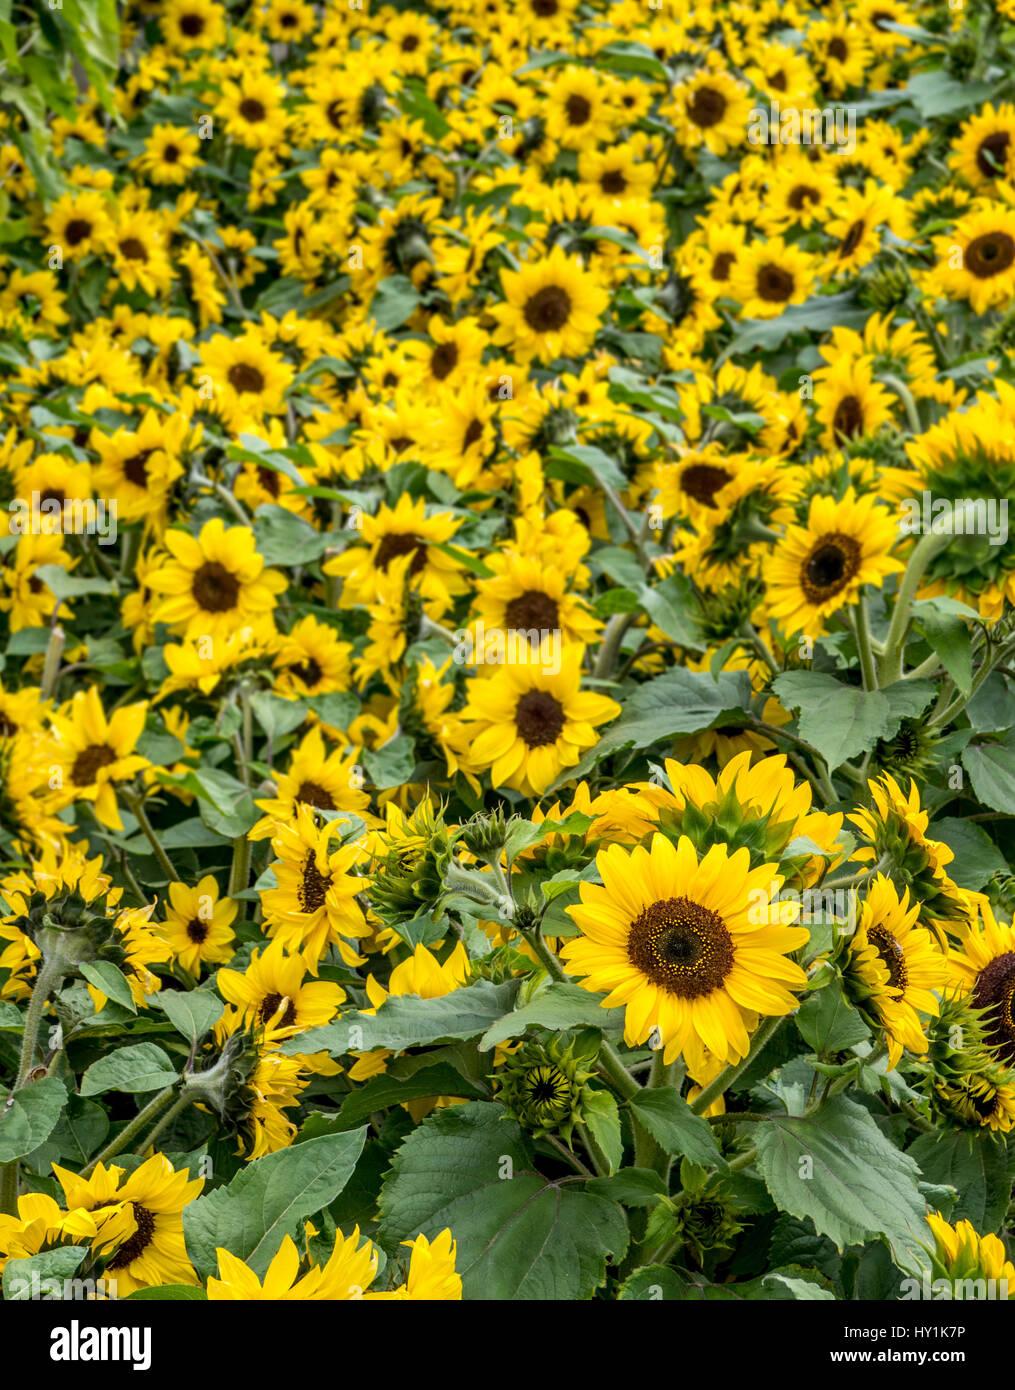 Munchkin dwarf sunflowers - Stock Image